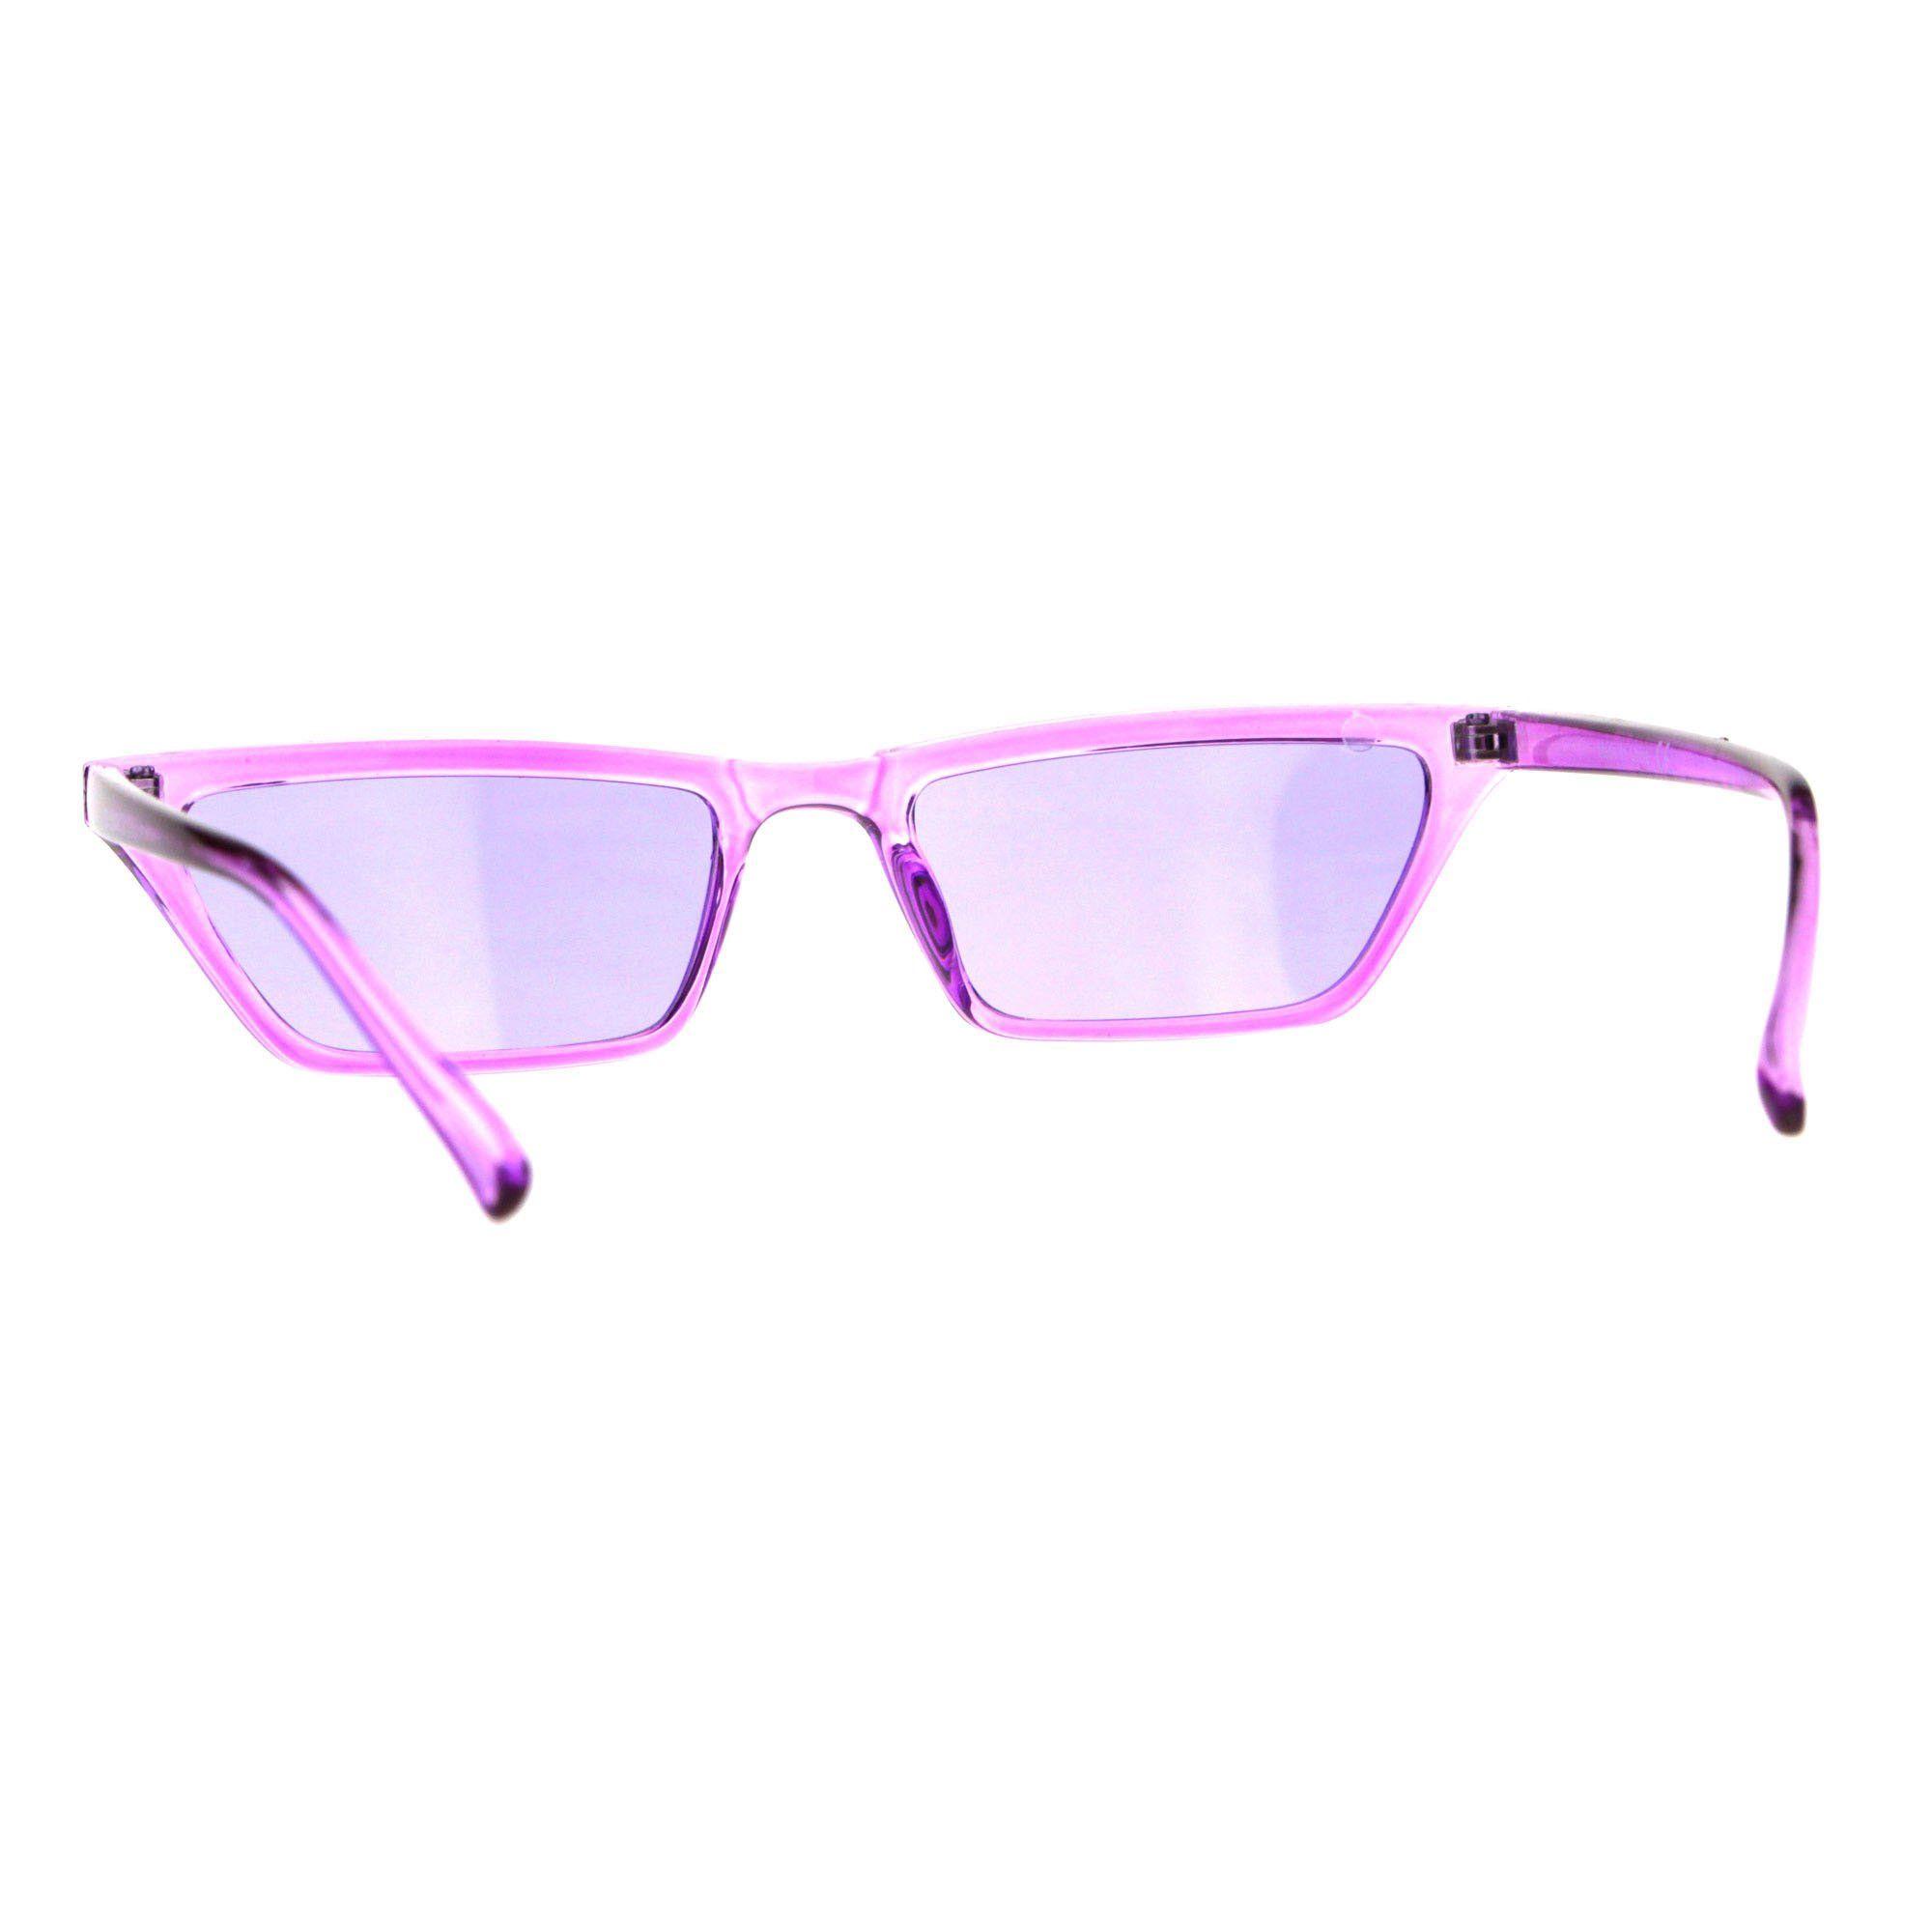 c9d3f3b3c62 Womens skinny sunglasses flat trapezoid shape retro fashion shades  measurements jpg 2000x2000 Trapezoid sunglasses